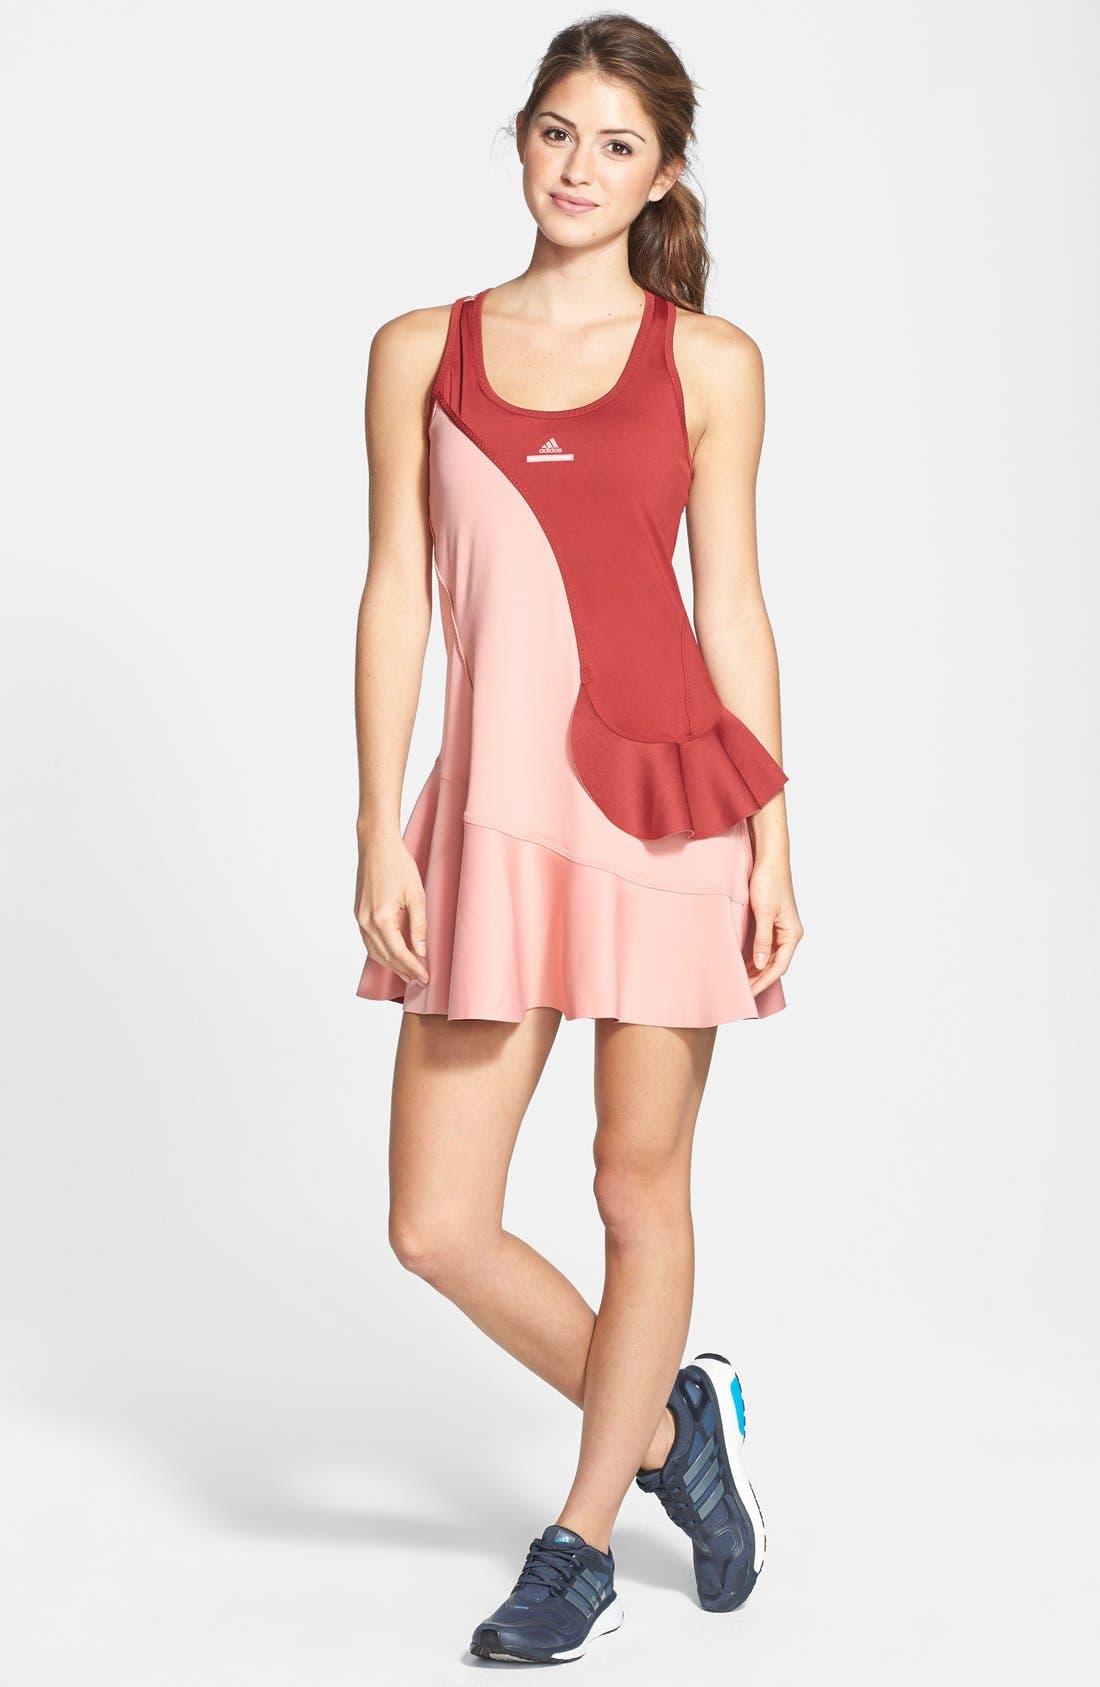 Main Image - adidas by Stella McCartney 'Barricade' Ruffled Dress